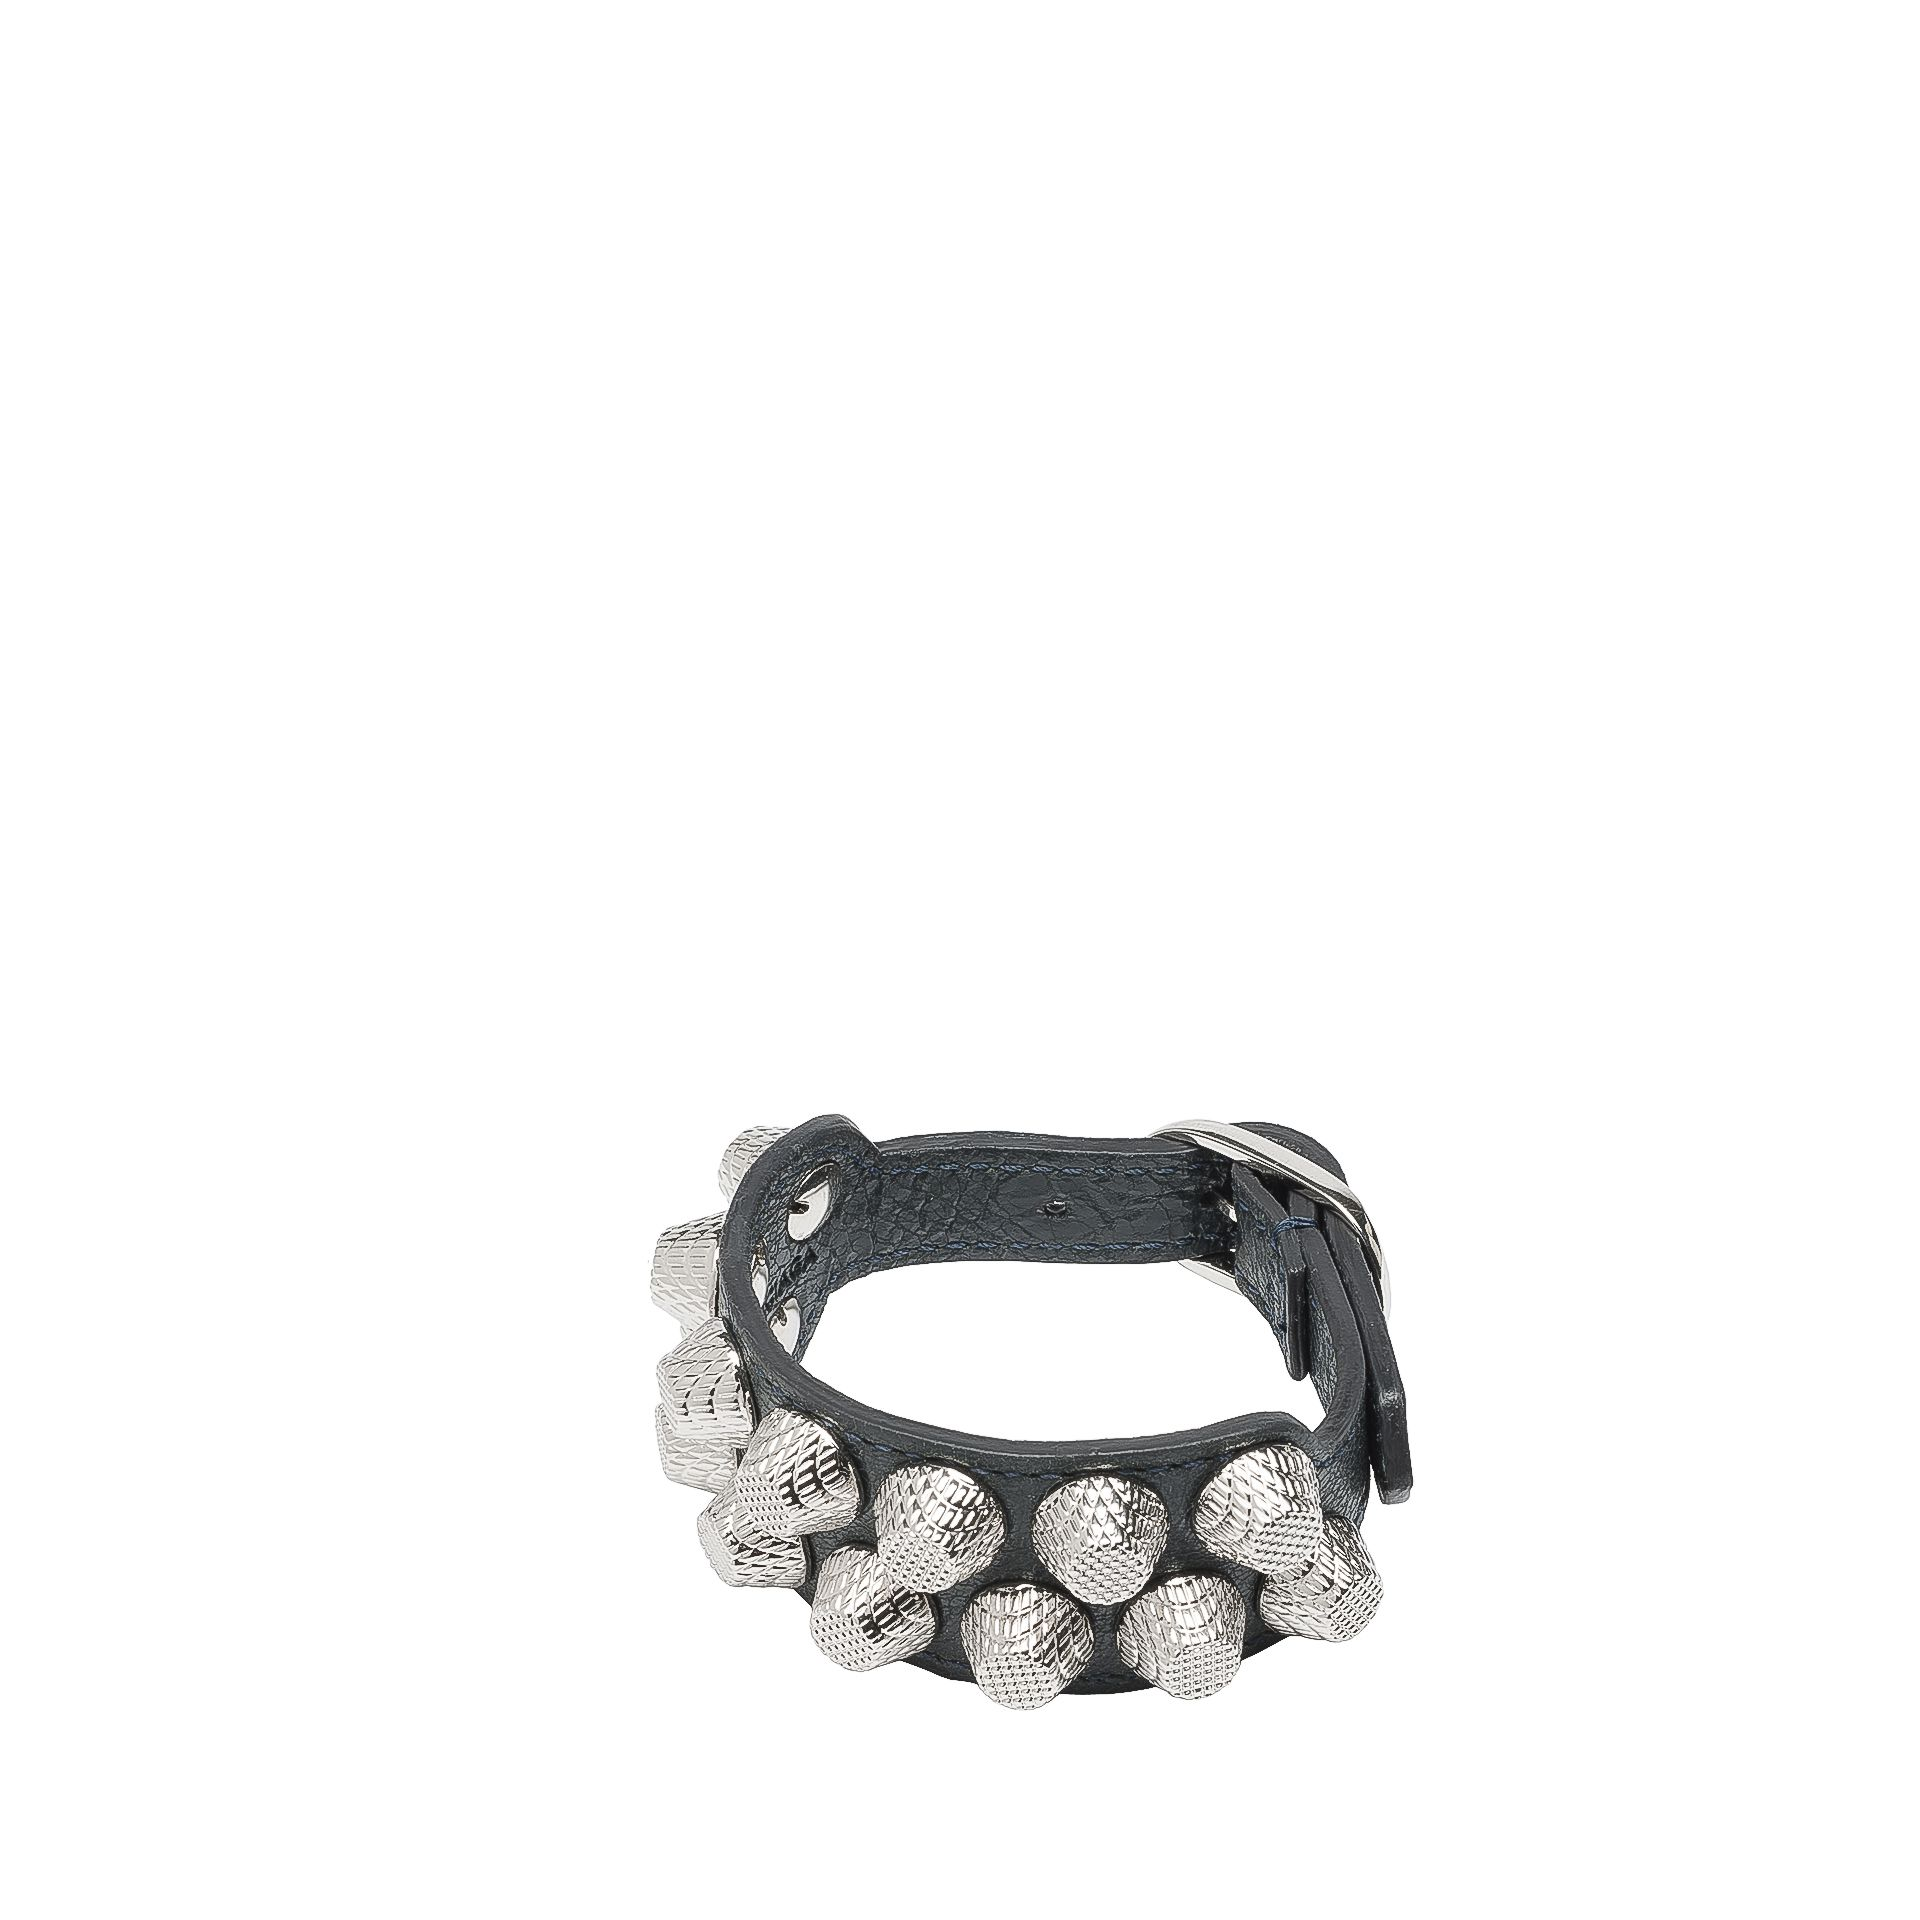 BALENCIAGA Balenciaga Giant Bracelet Stud M Argent Bracelet Giant Stud D f